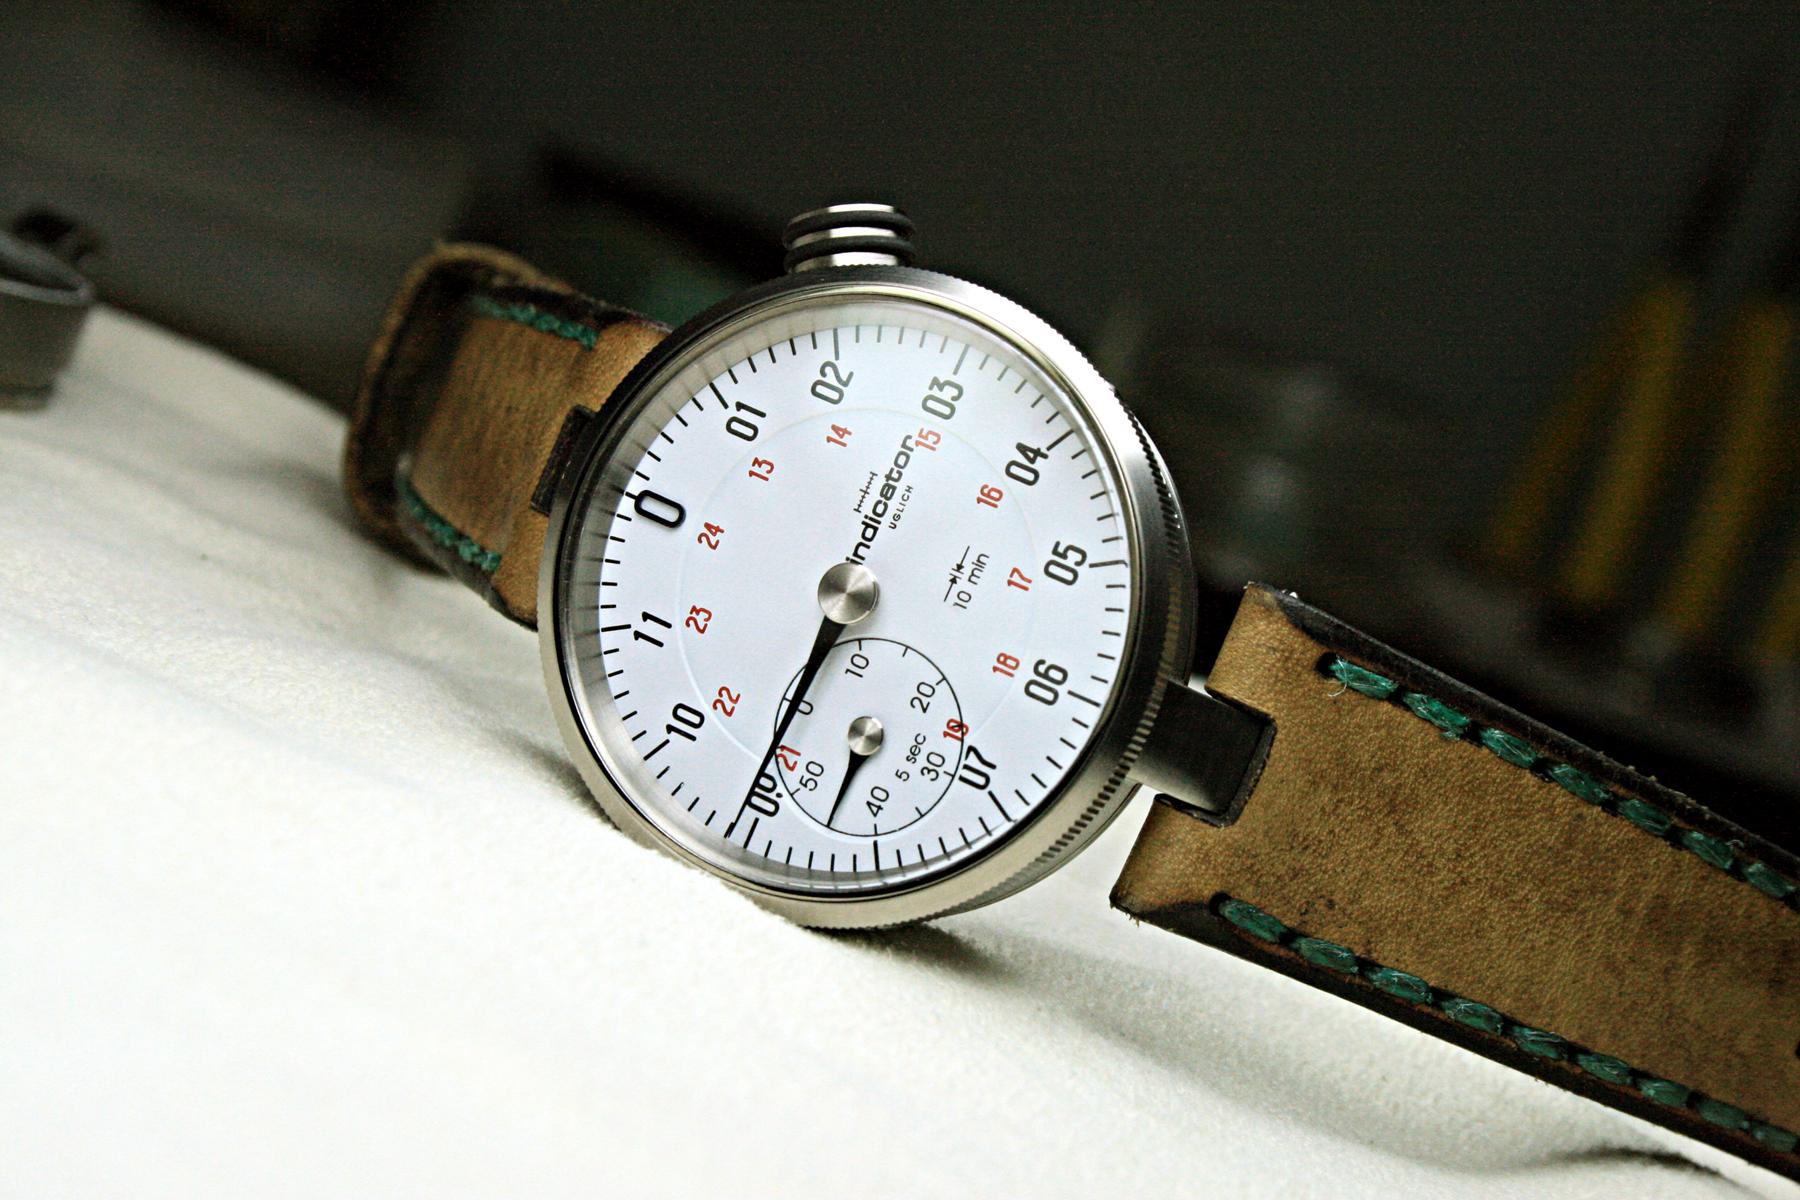 New RUSSIAN time tool INDICATOR-img_8354-1.jpg